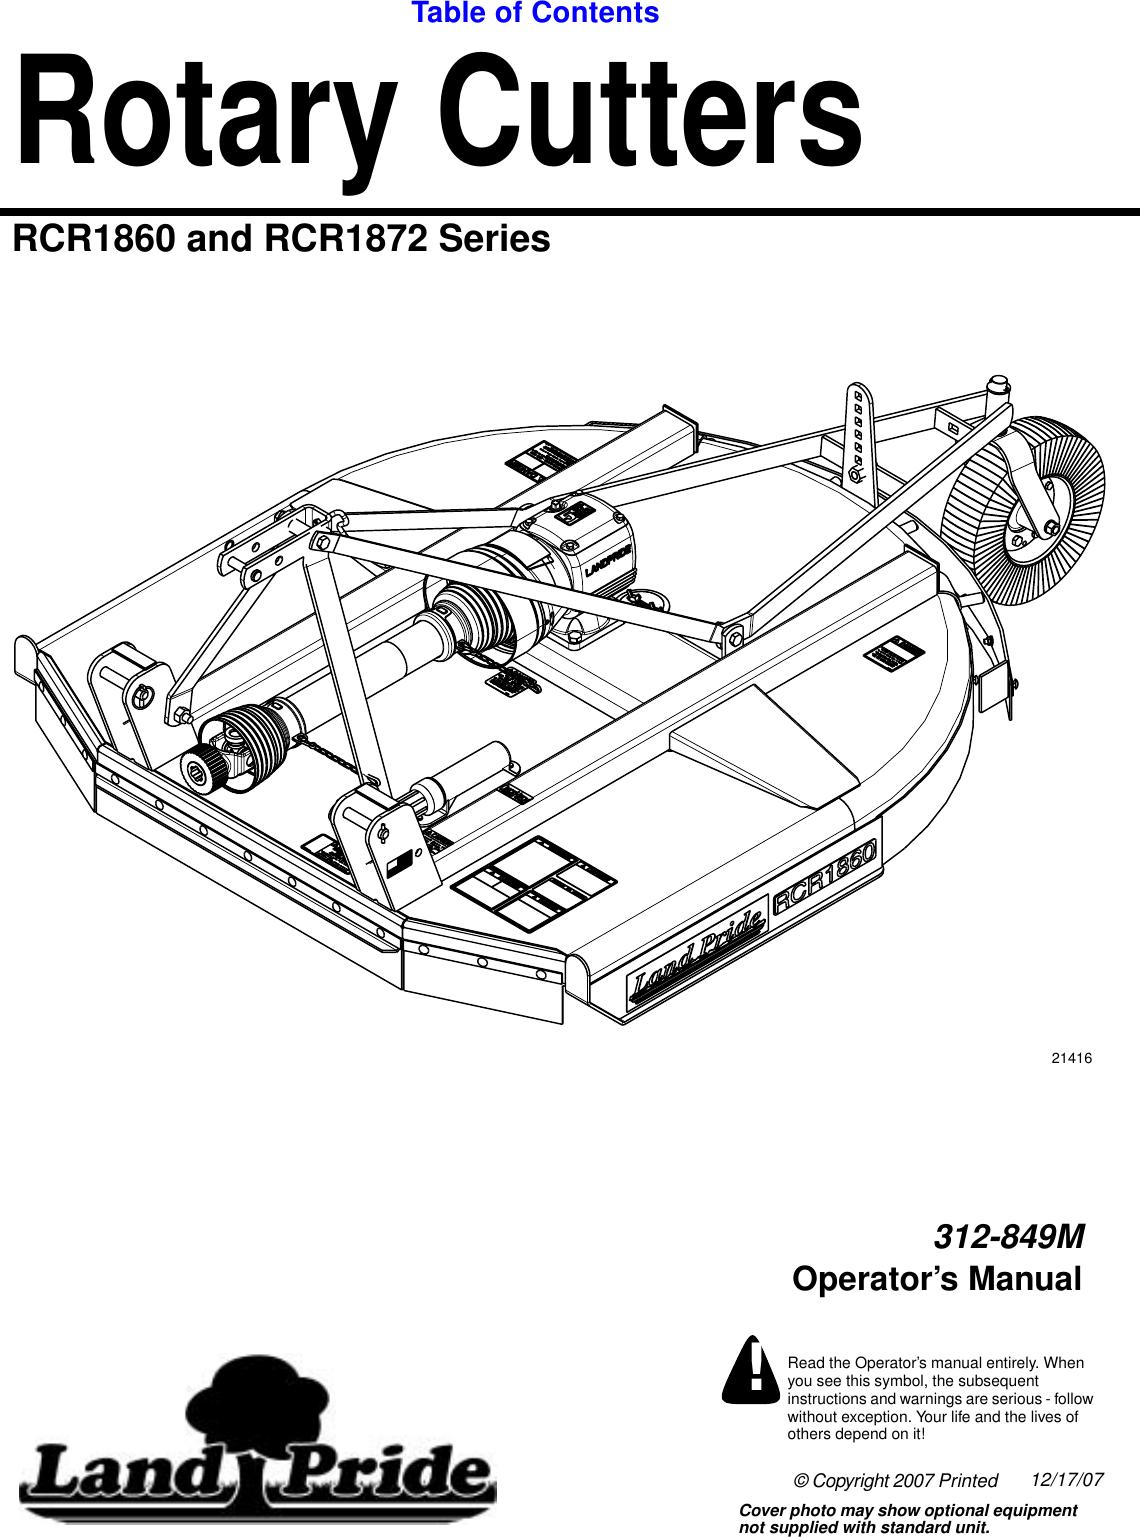 Land Pride Rotary Cutters Rcr1860 Users Manual RCR1872